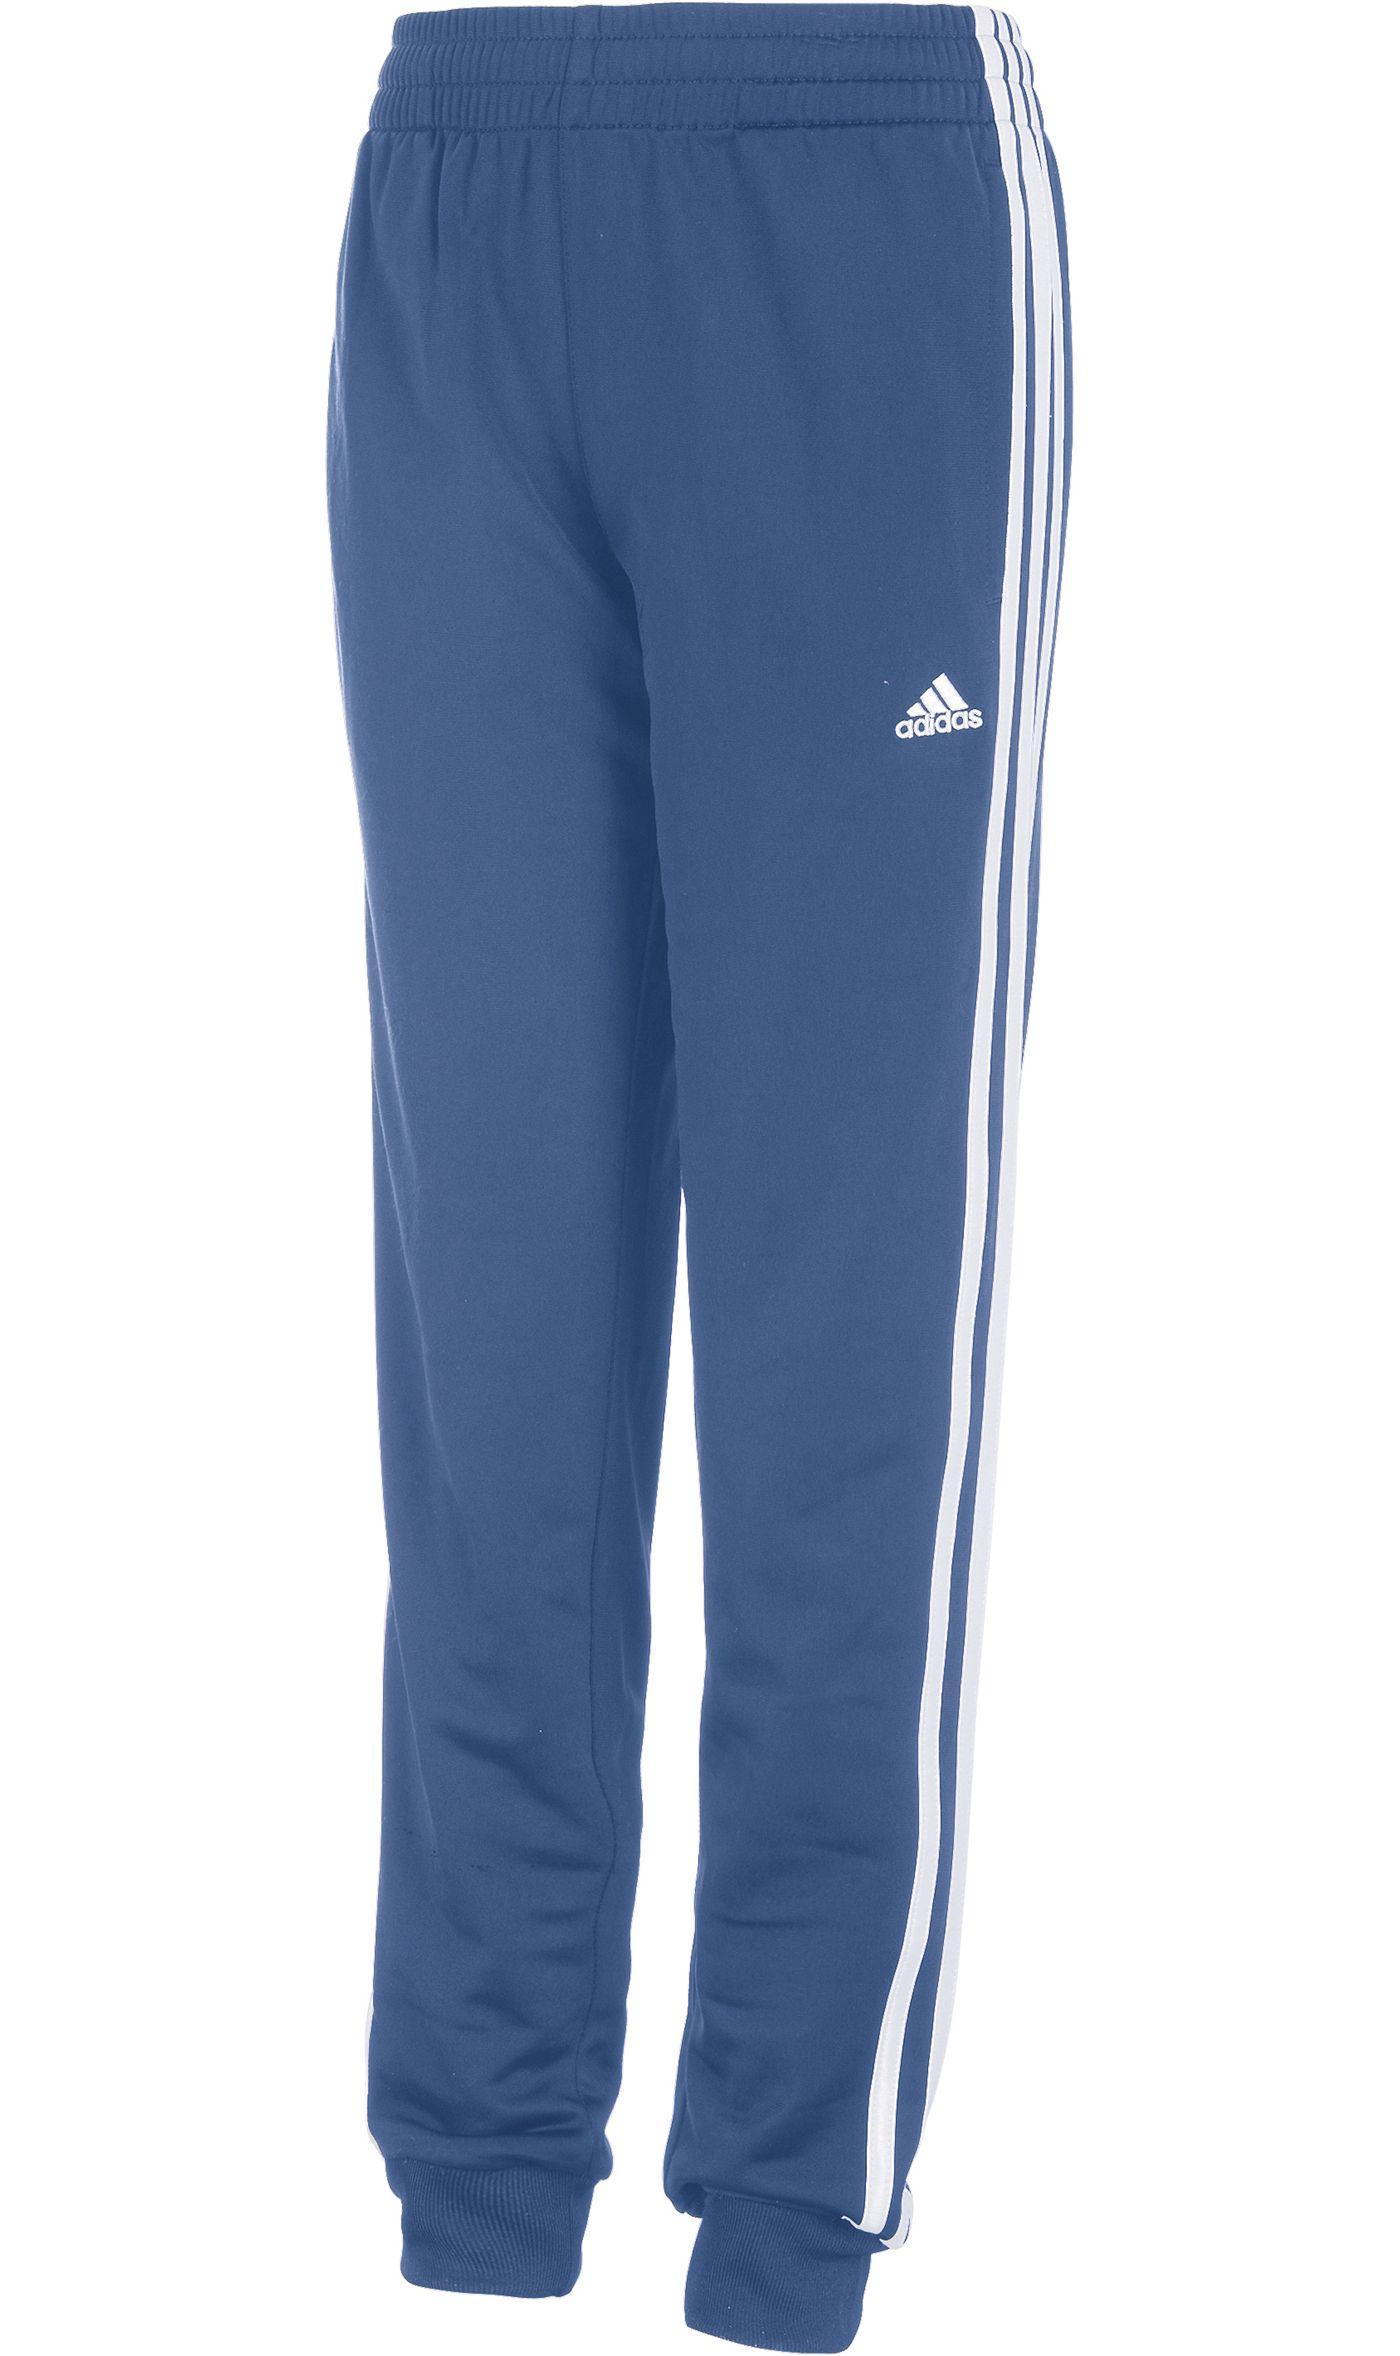 adidas Boys' Tricot Jogger Pants